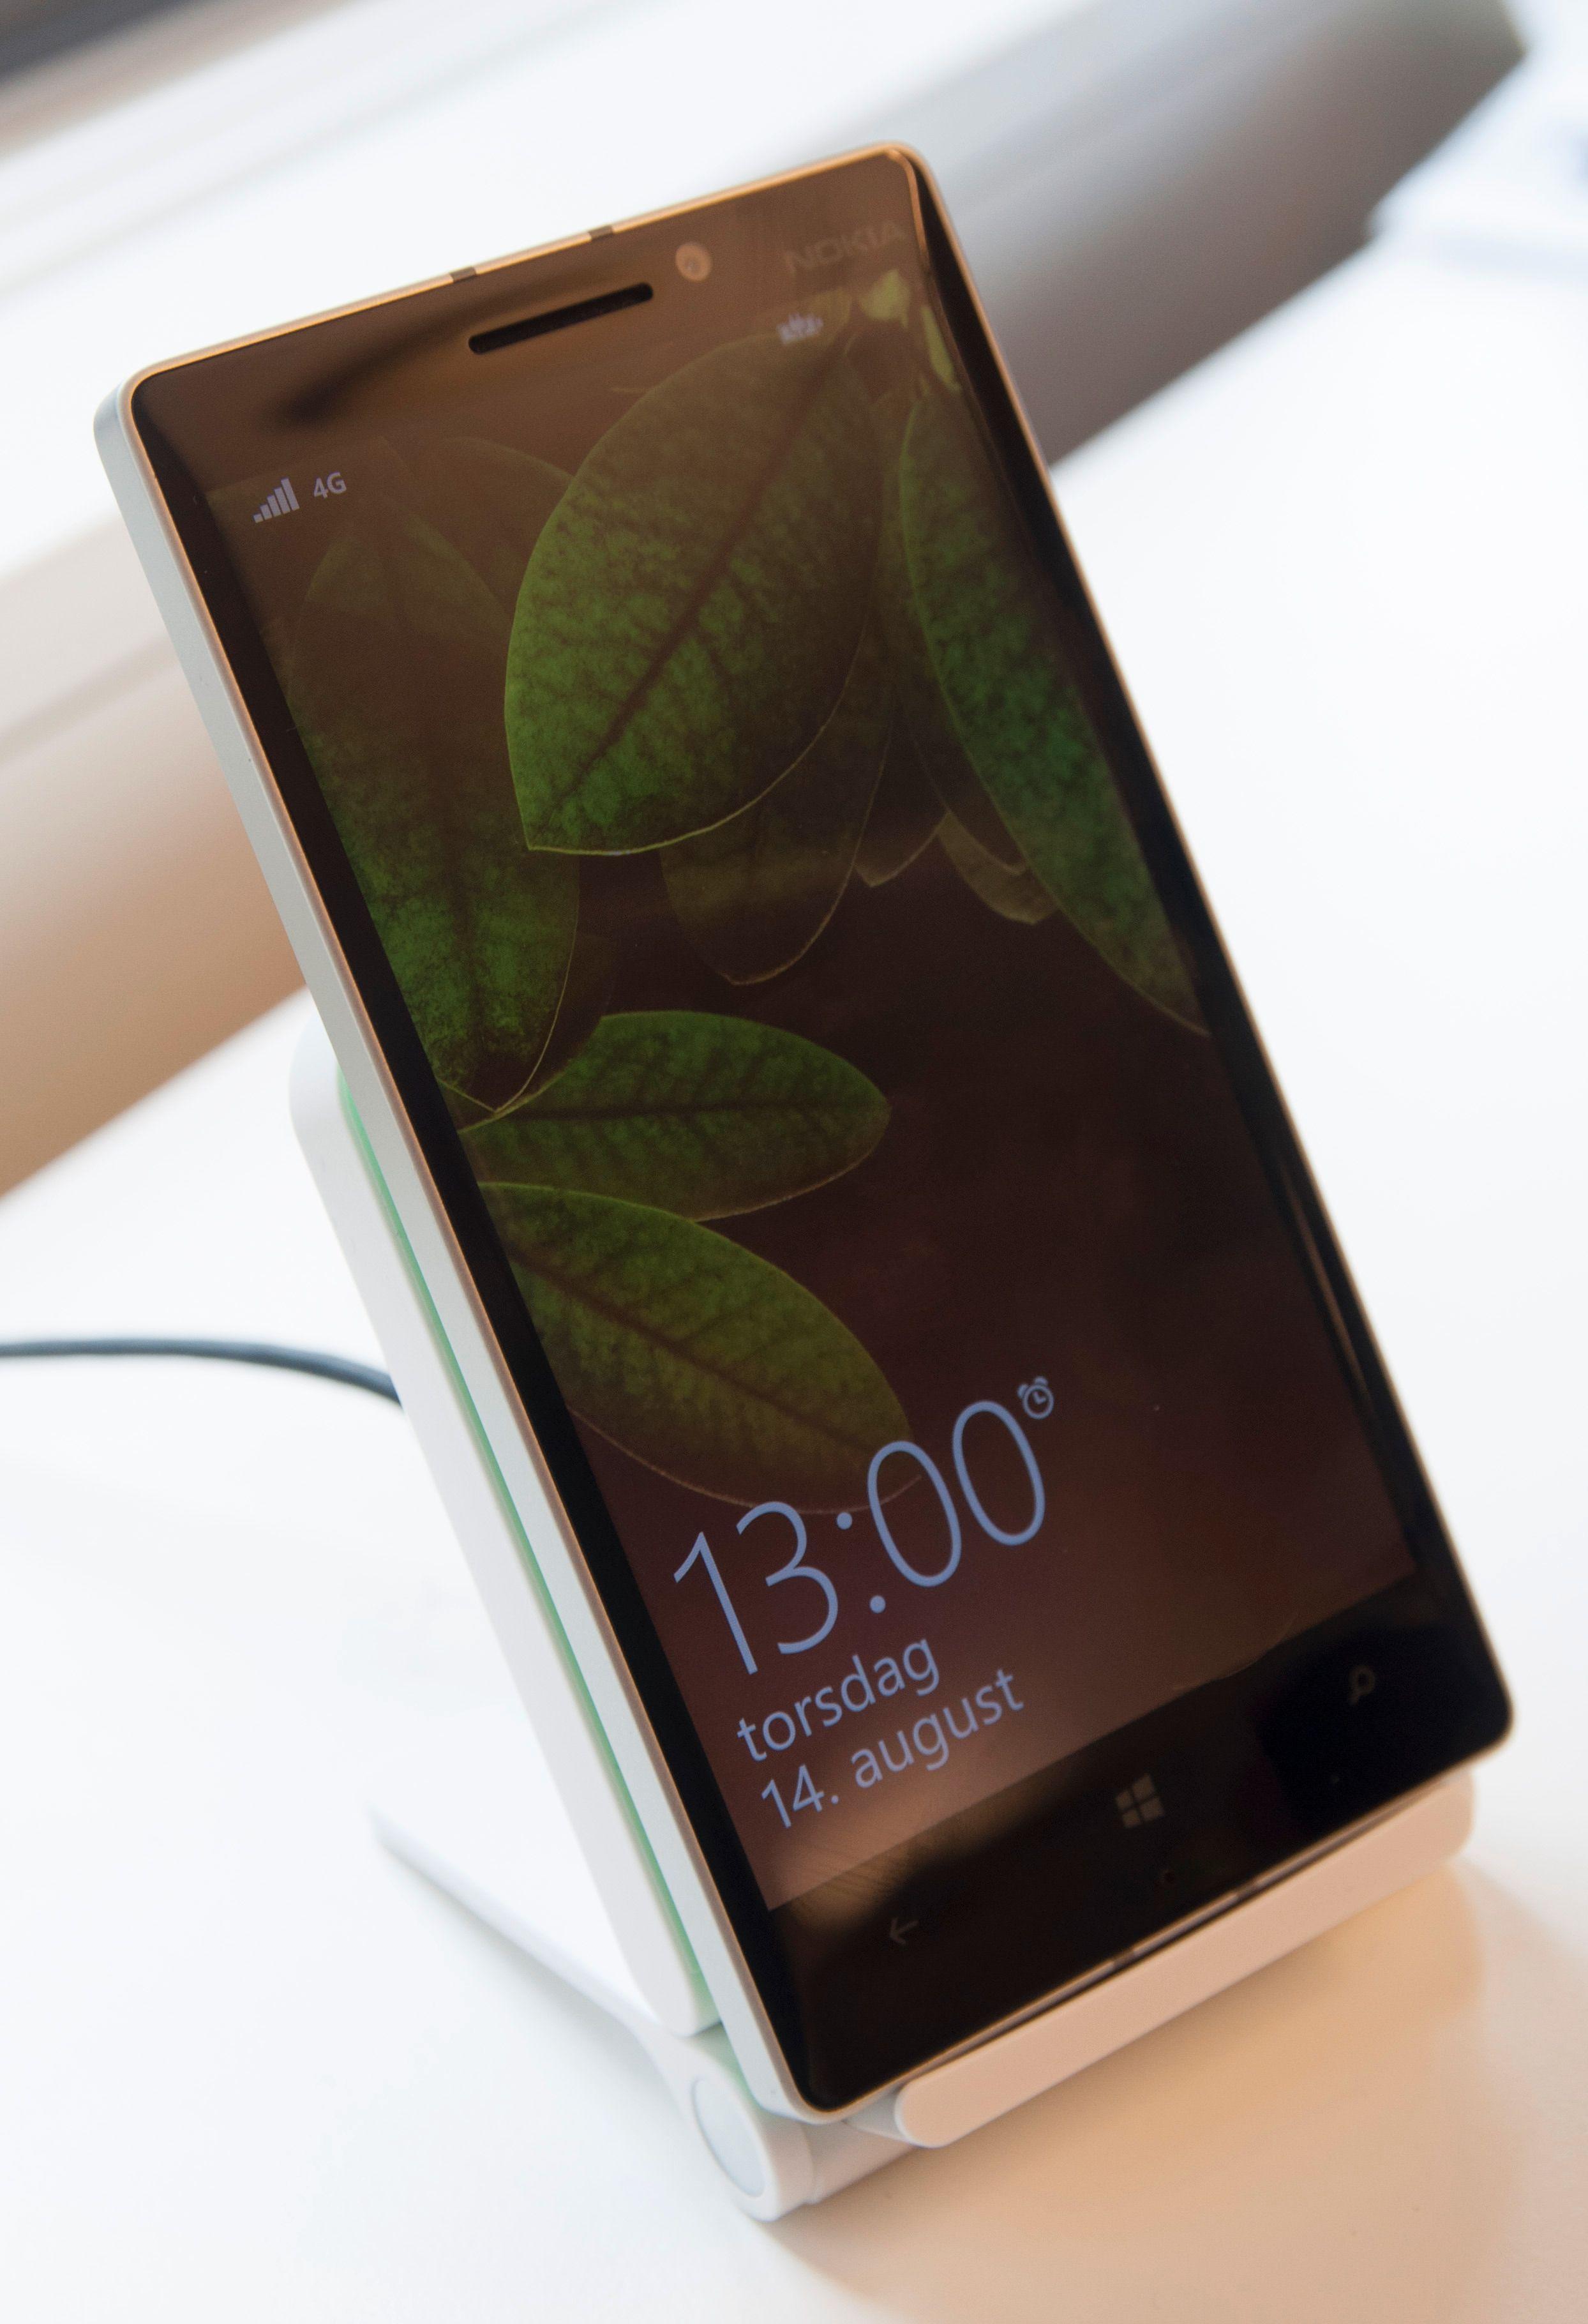 Nokia Lumia 930 er en av modellene med trådløs lading integrert.Foto: Finn Jarle Kvalheim, Amobil.no